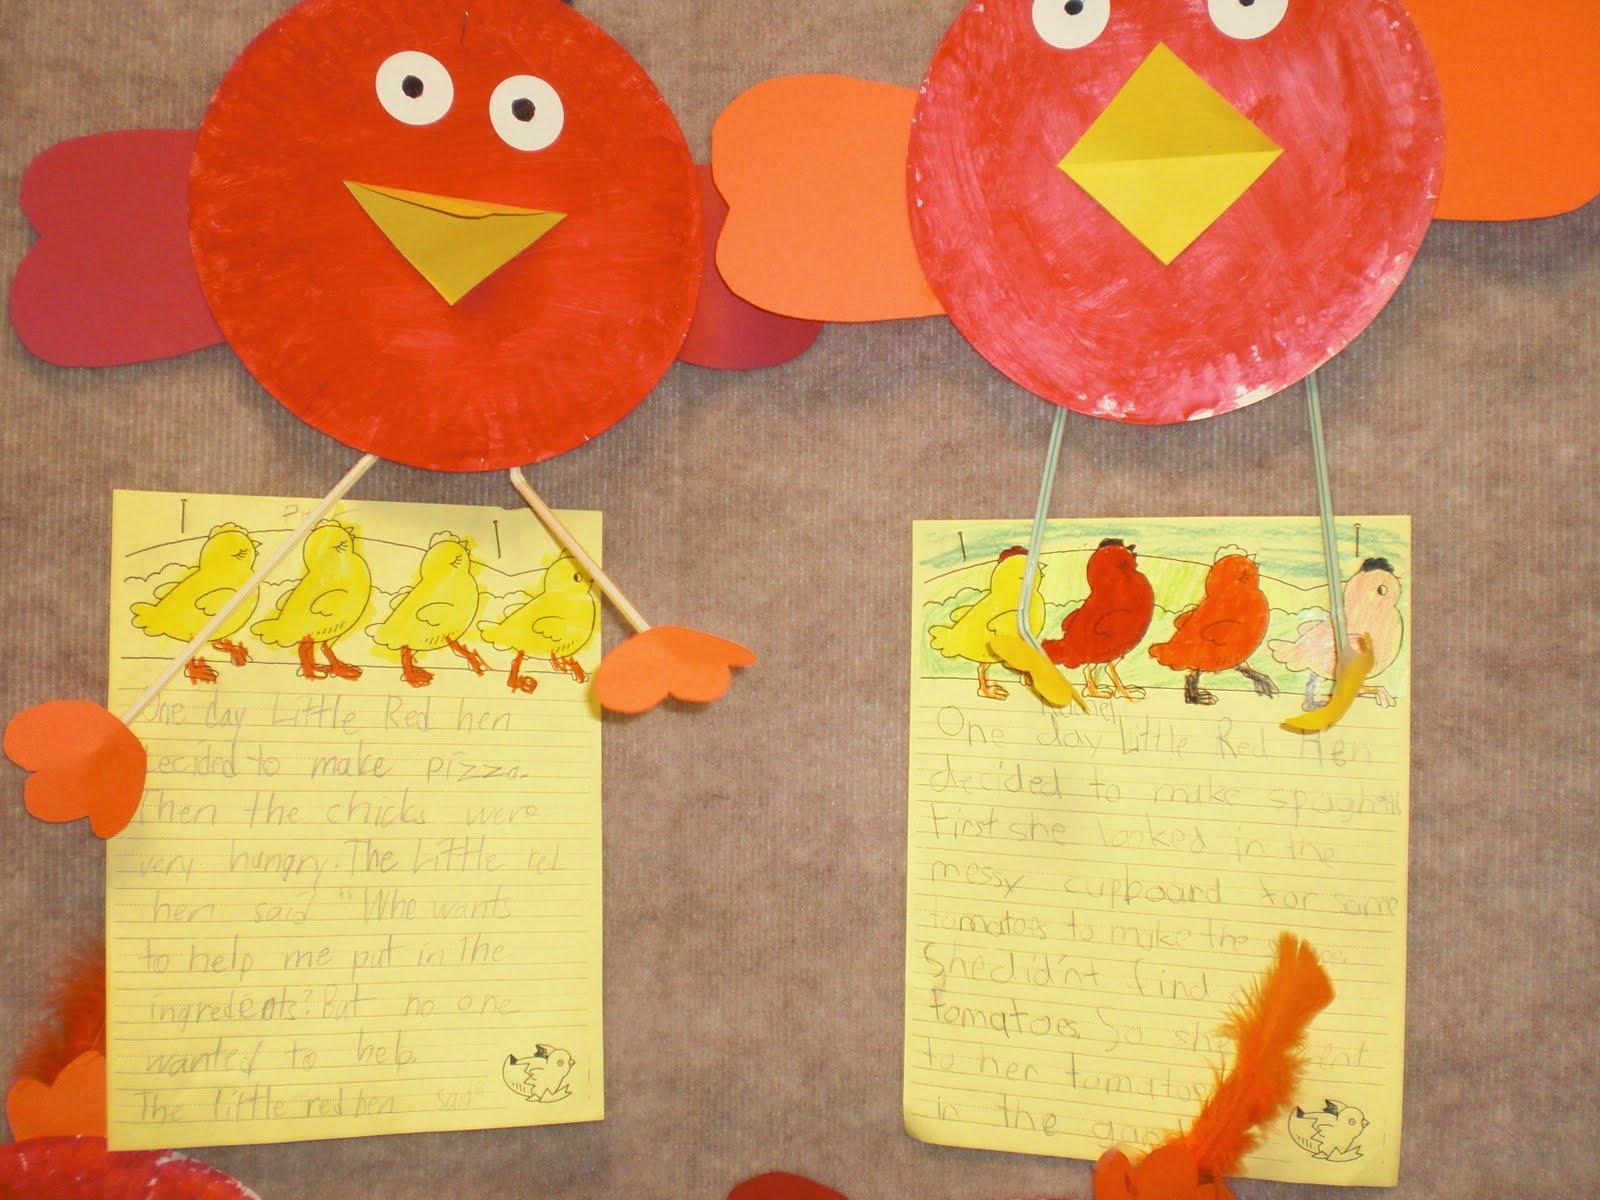 Patties Classroom The Little Red Hen